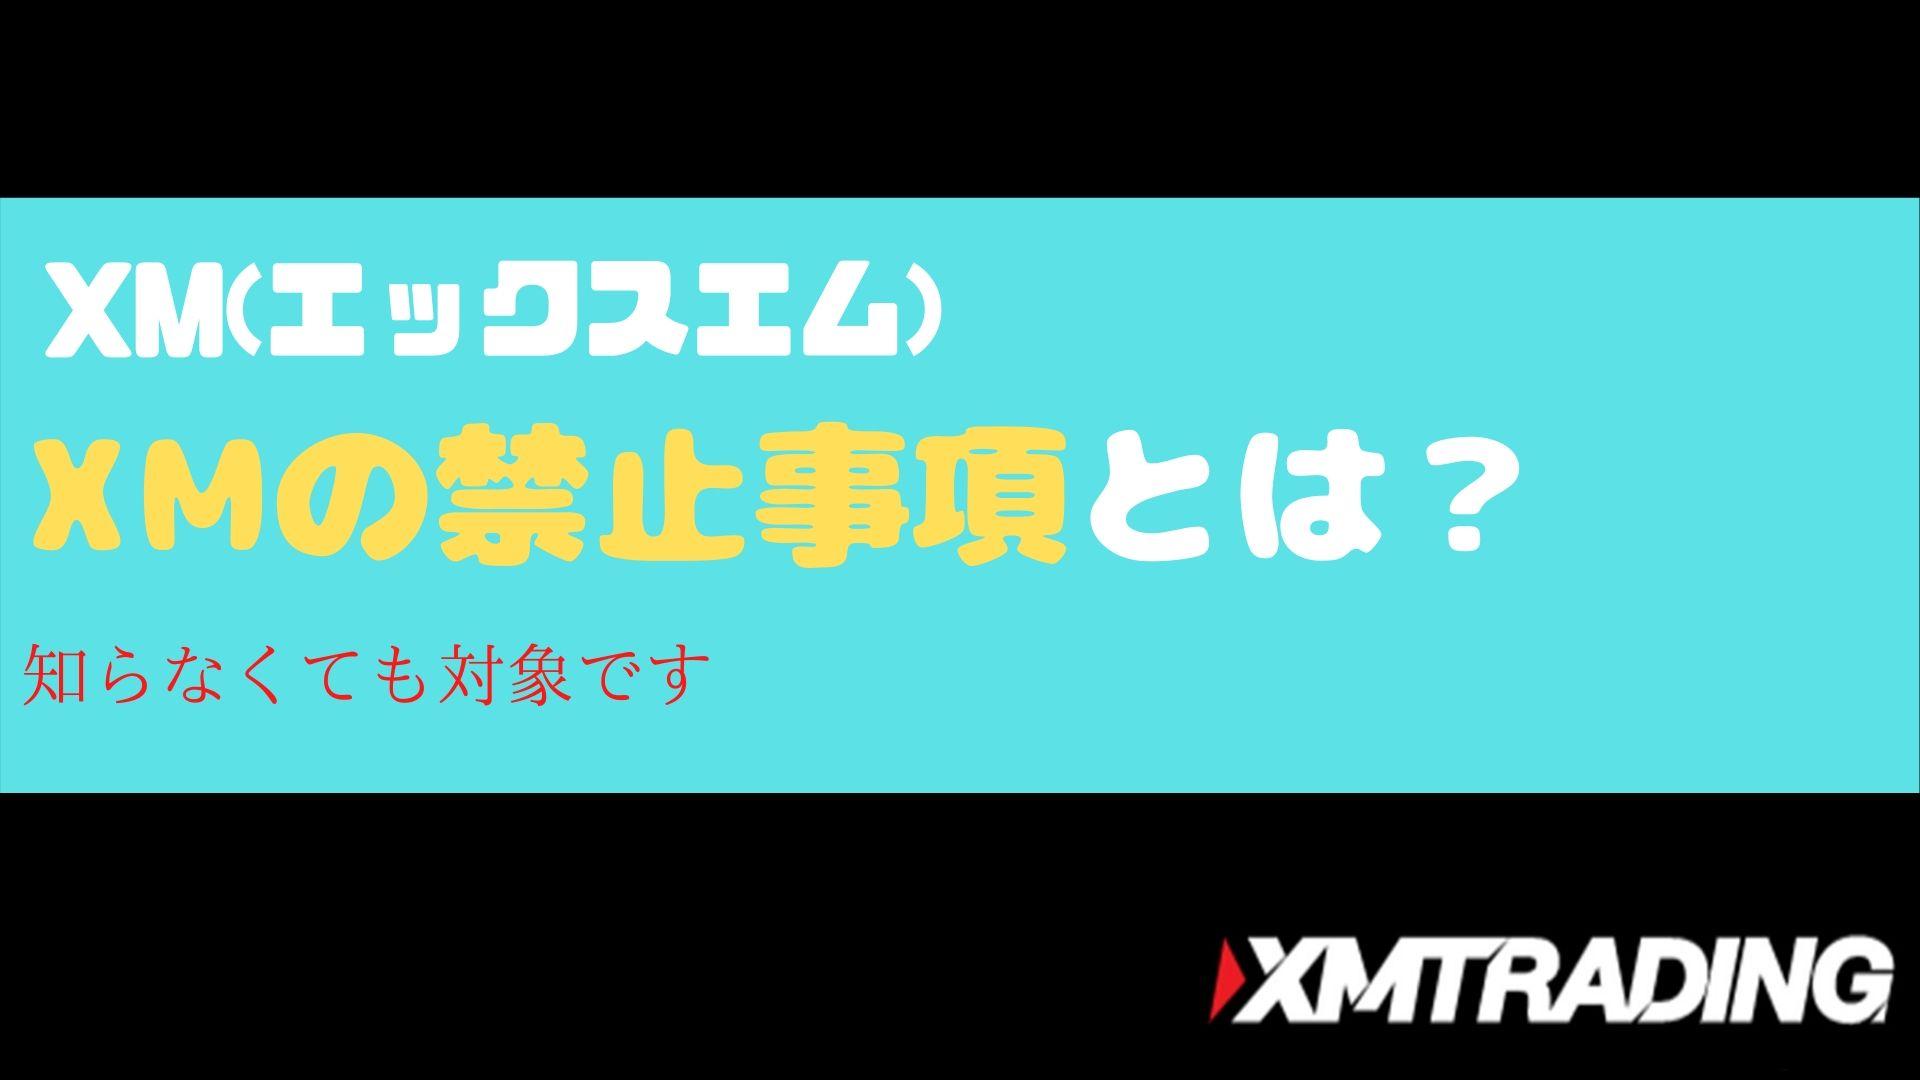 xm-rules-title